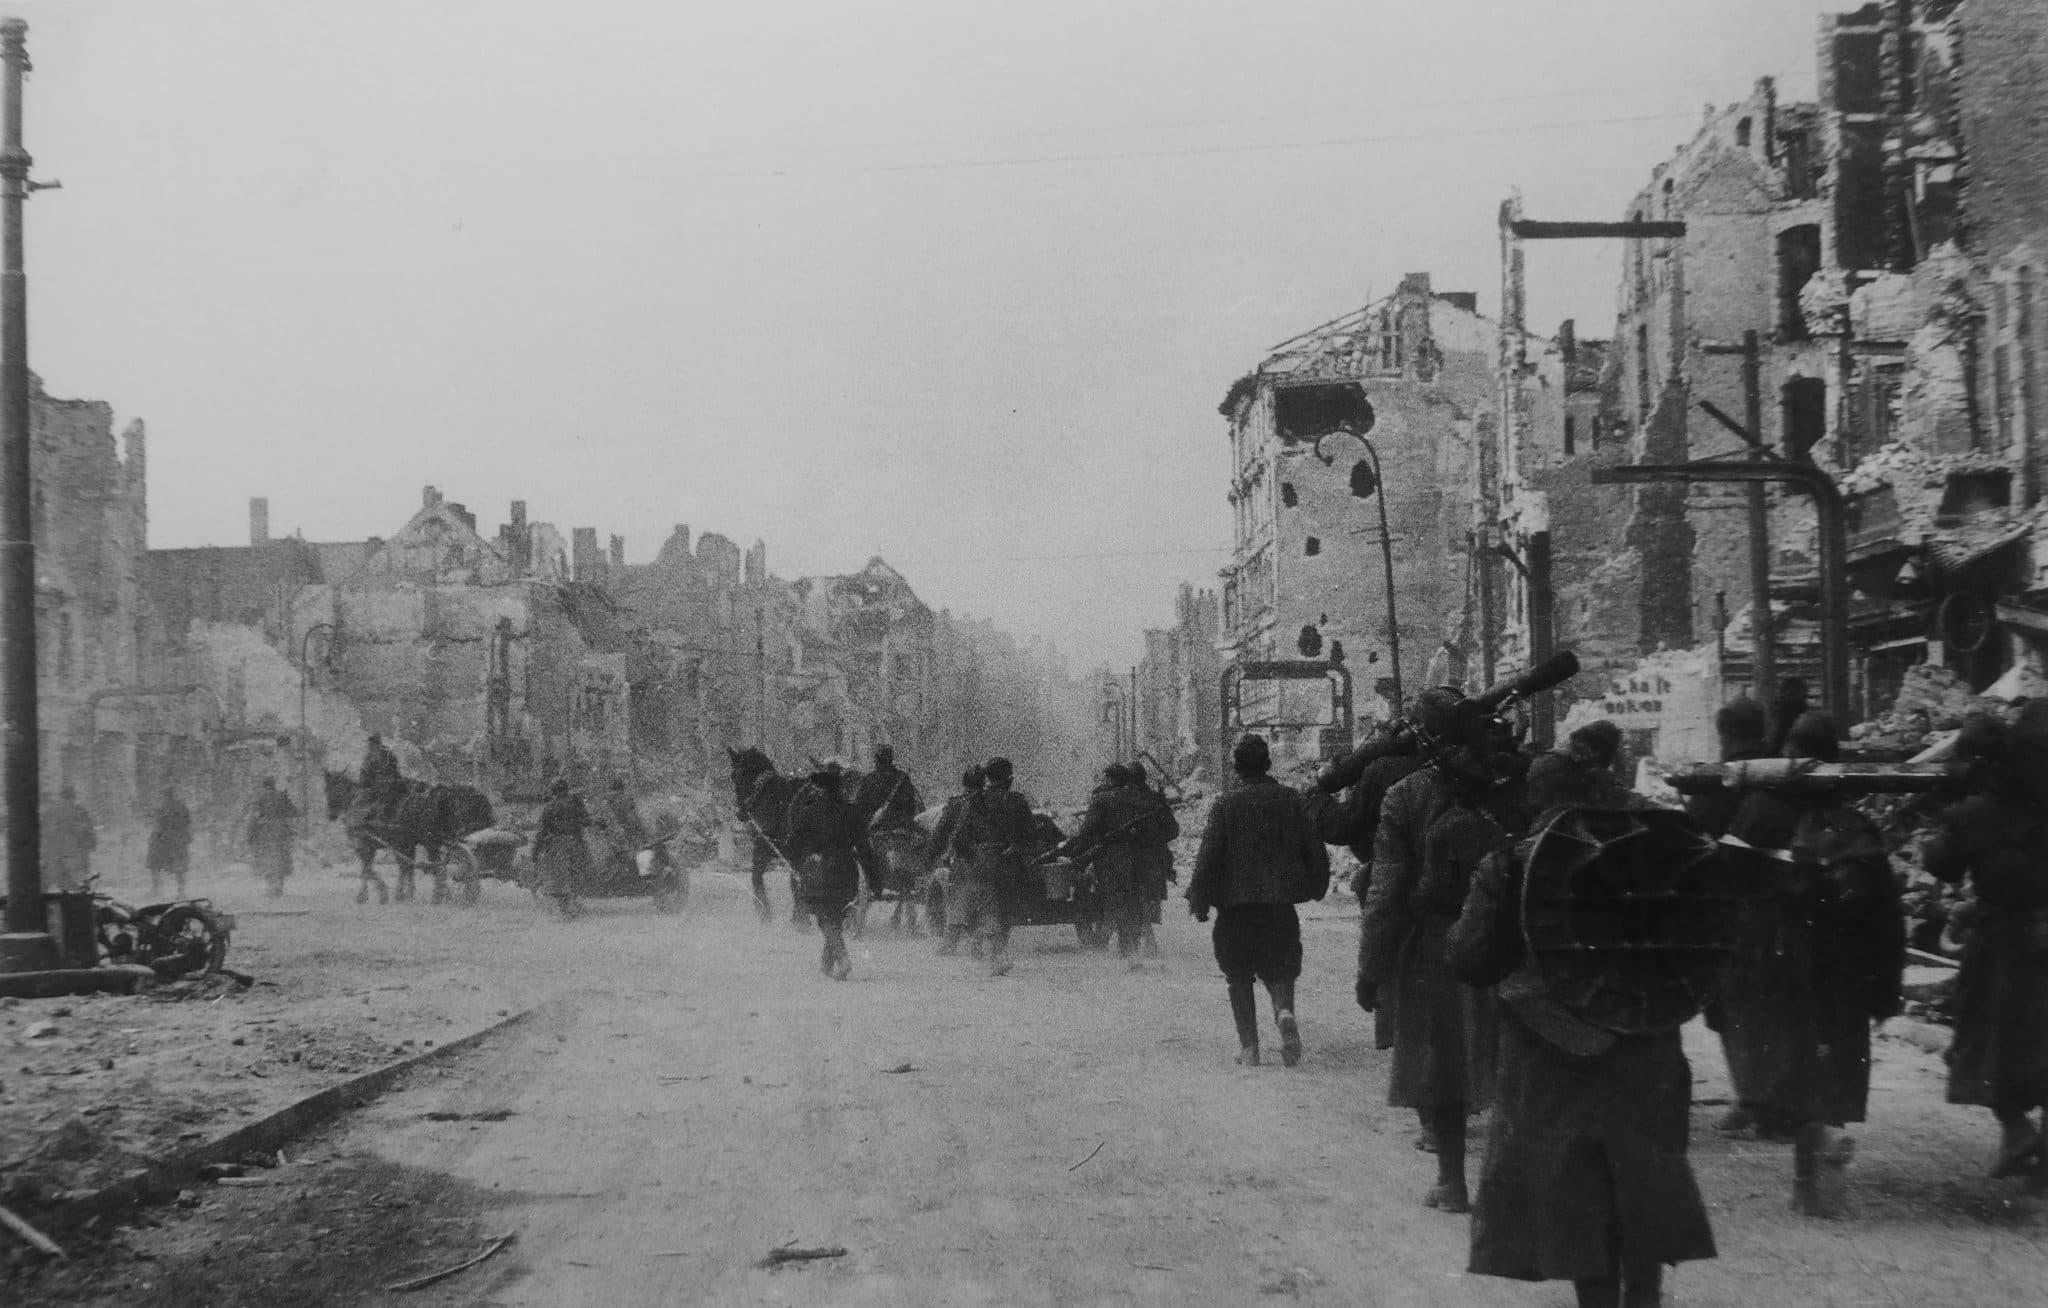 A column of Soviet artillerymen on the march along the Frankfurter Alee in Berlin